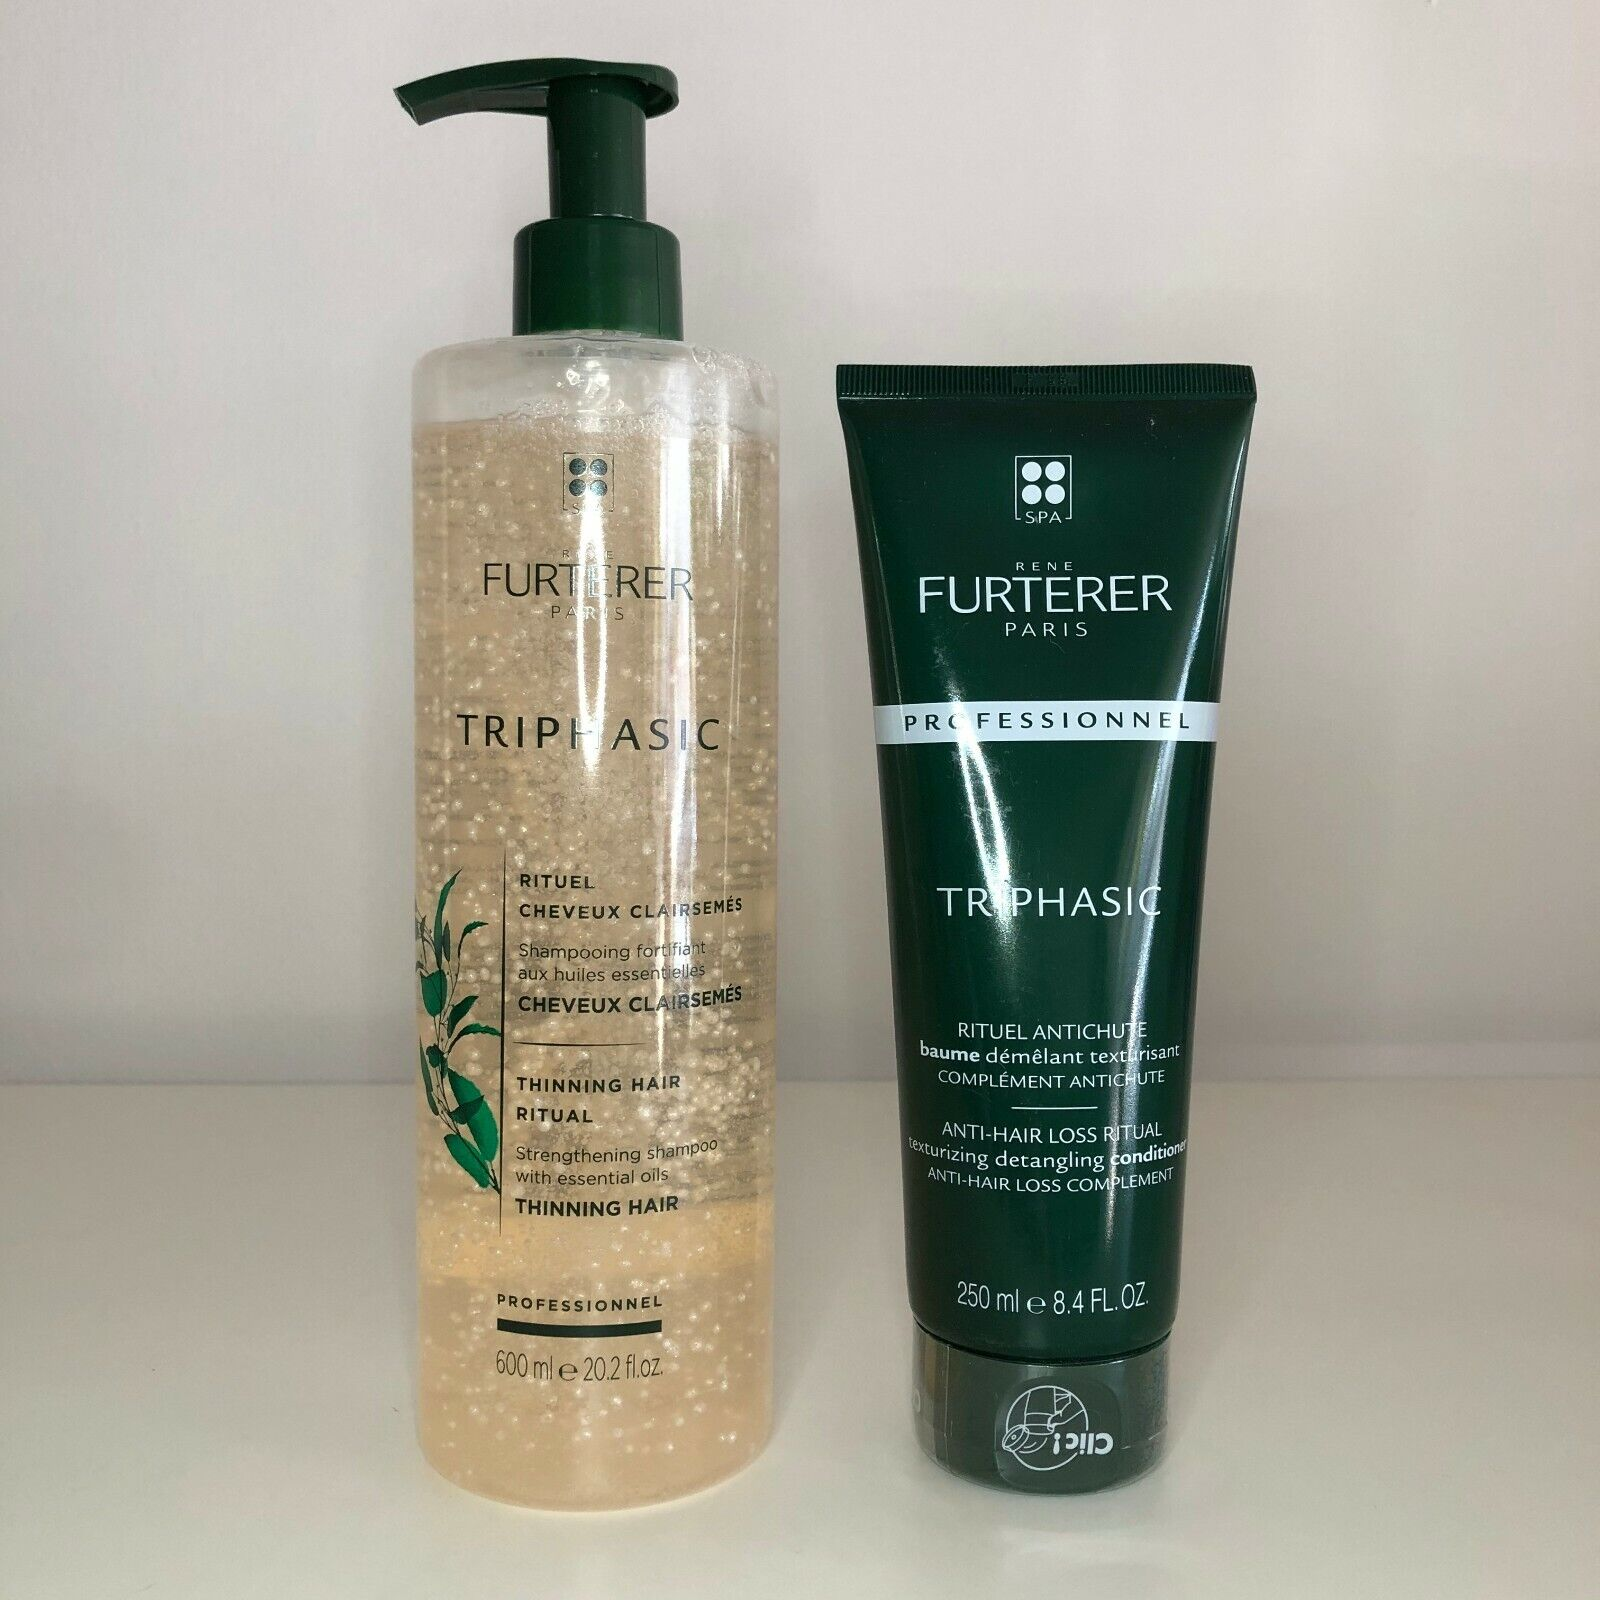 rene furterer triphasic thinning hair ritual strengthening